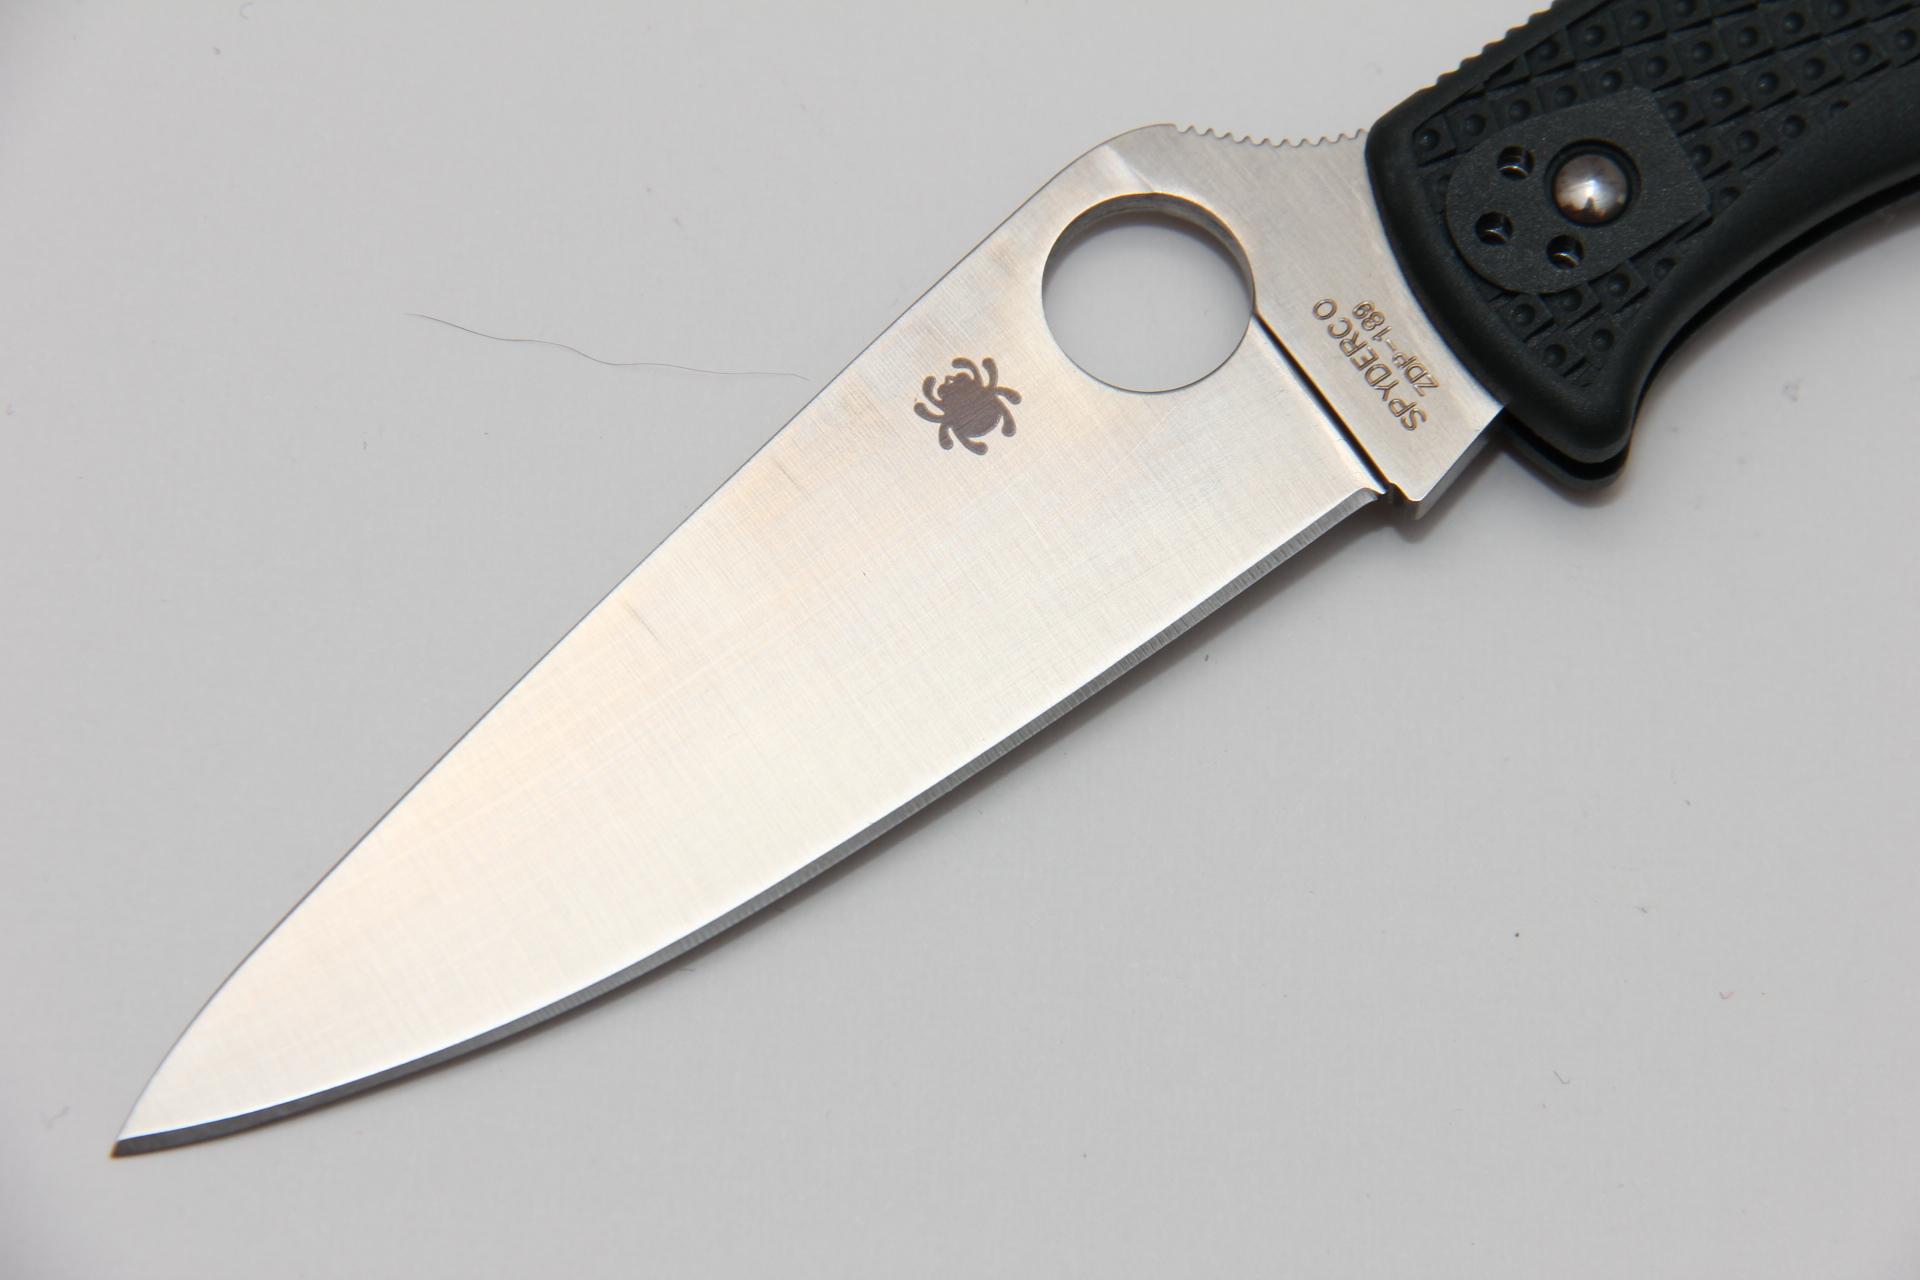 Нож Spyderco Endura 4 SC10PGRE ZDP-189 - фотография